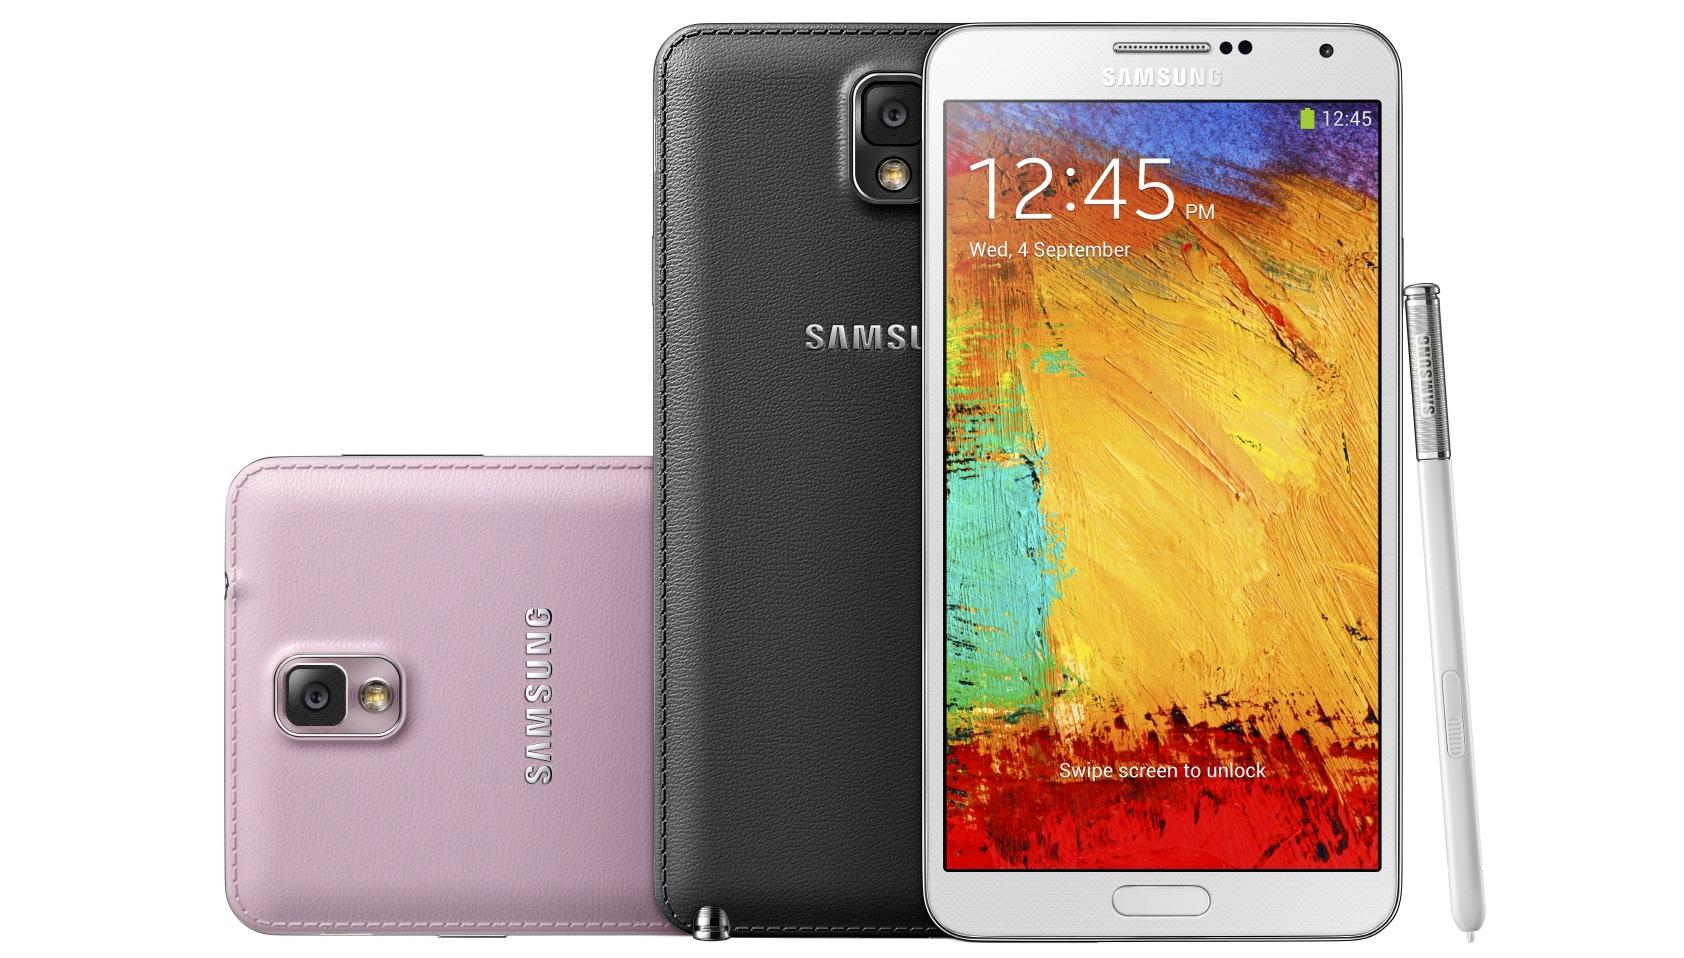 Harga Samsung Galaxy Note 3 Baru dan Bekas Pertengahan Agustus